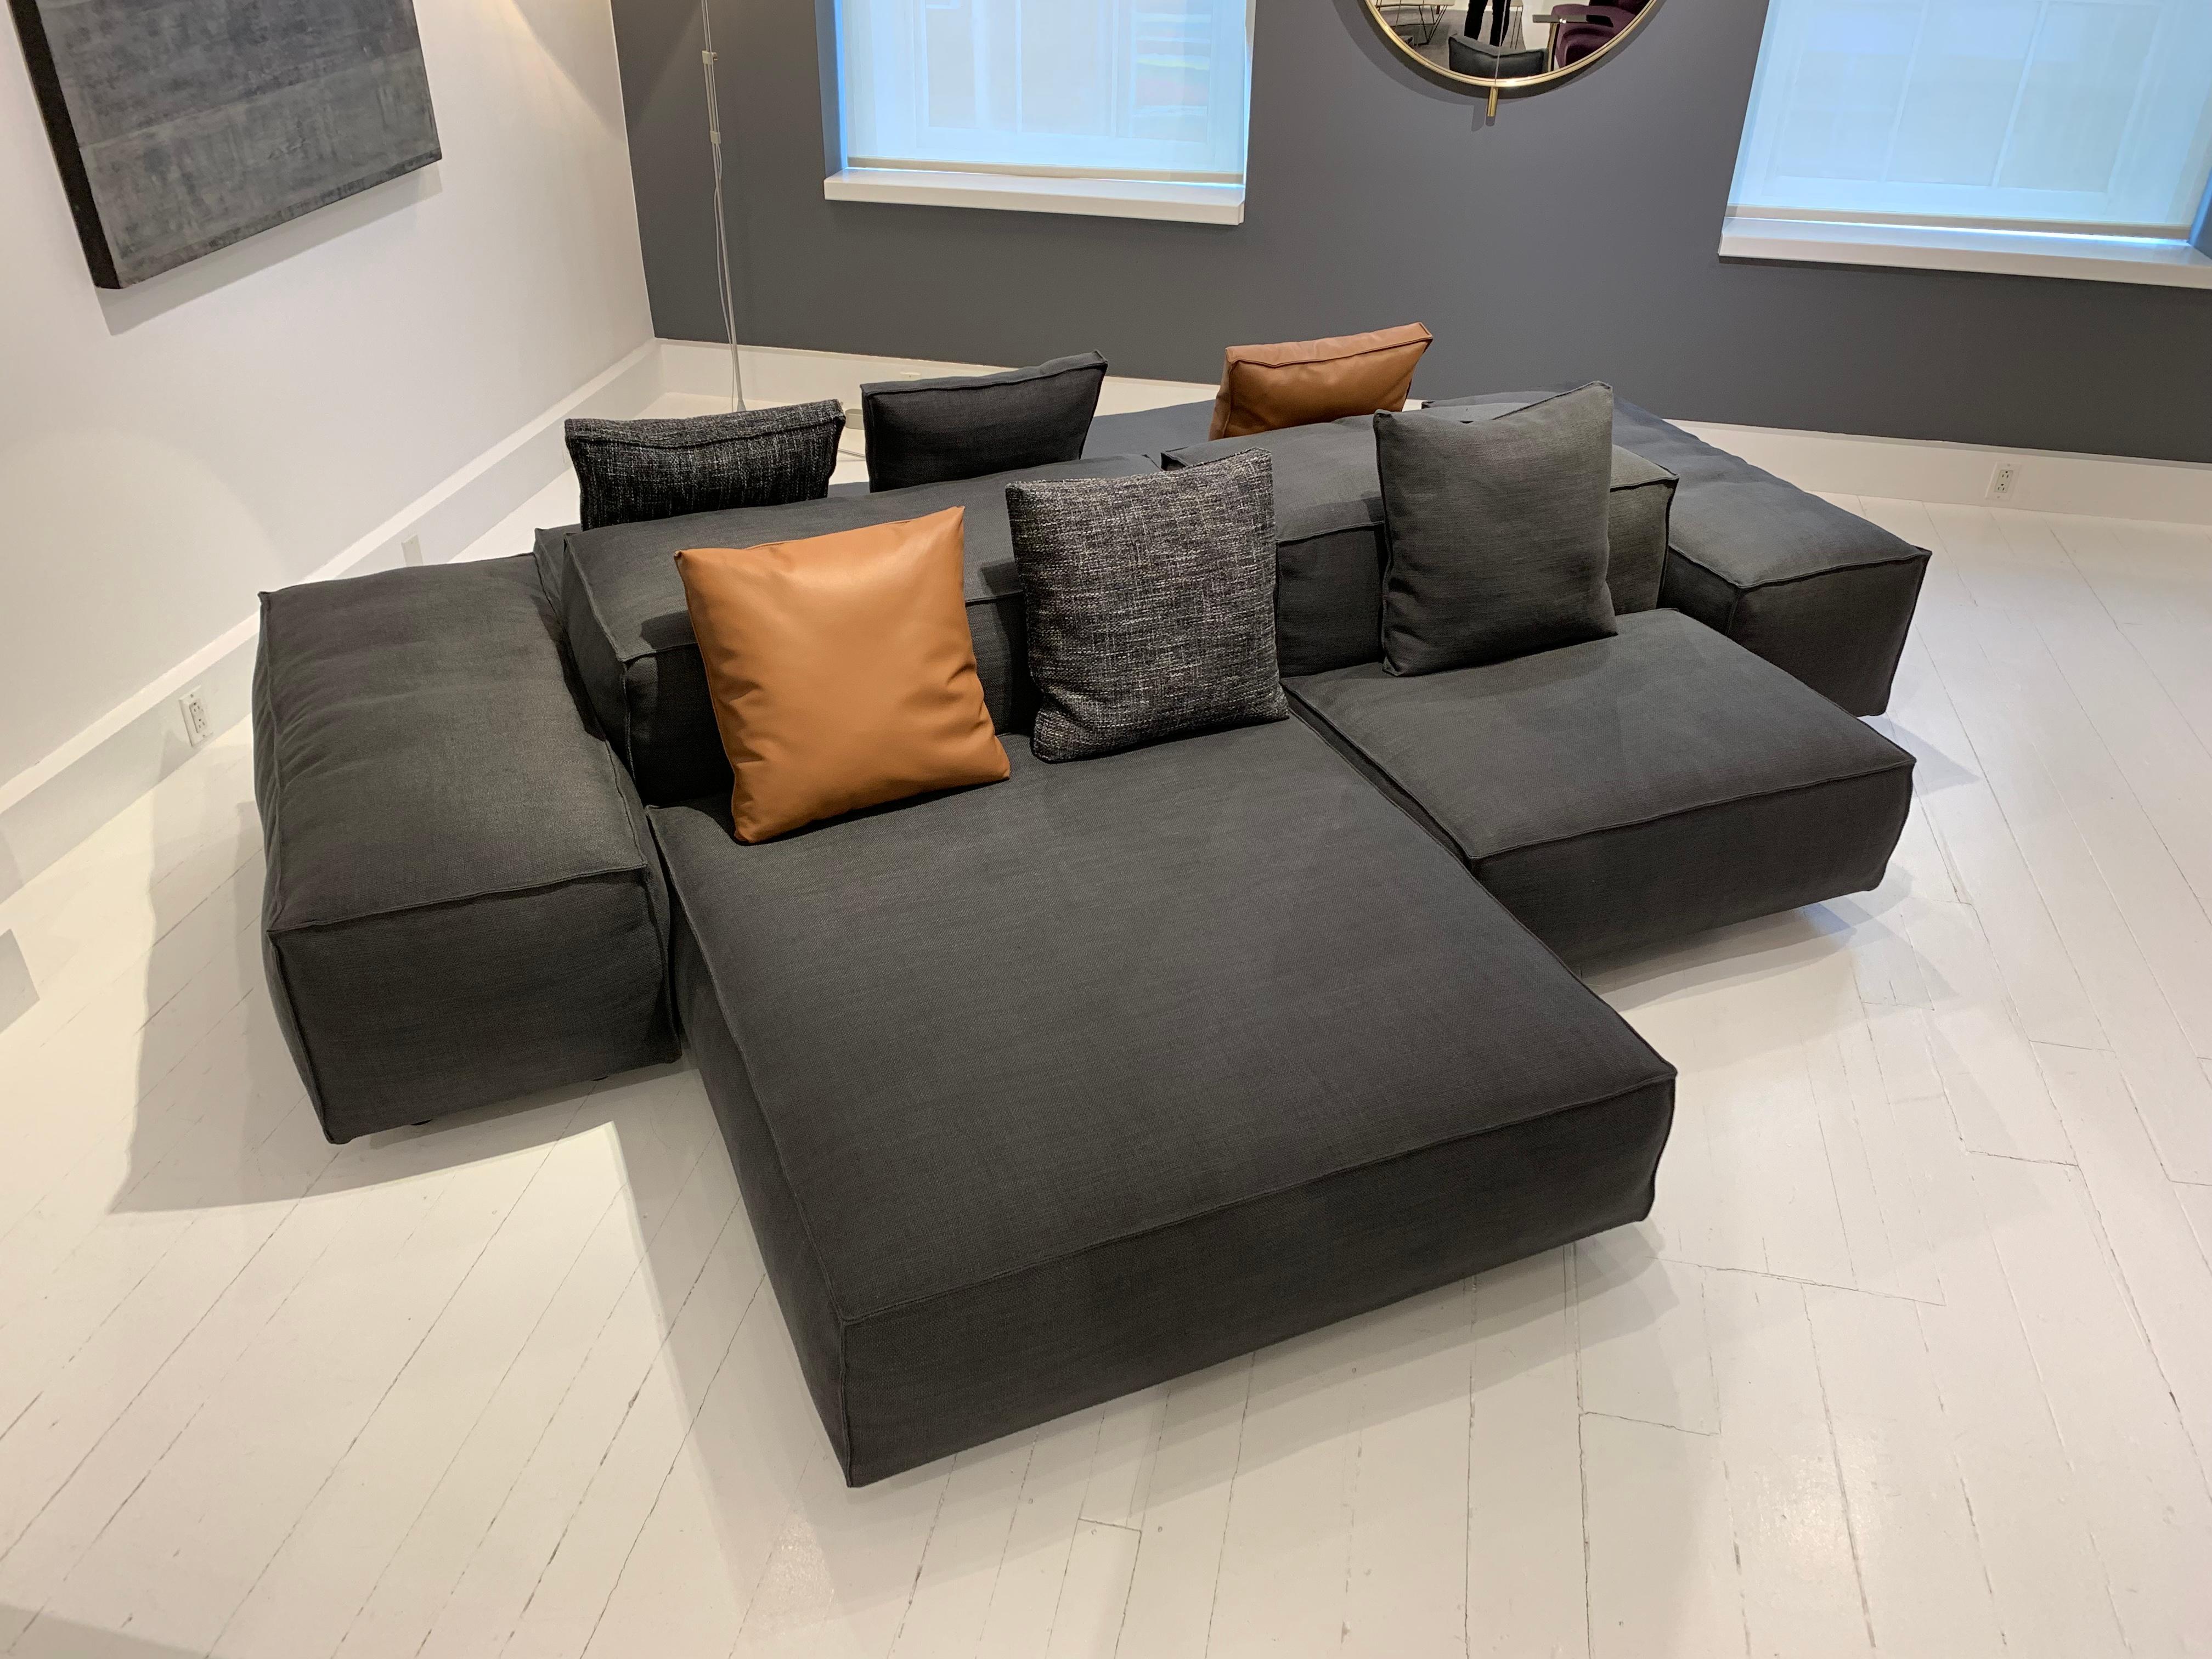 Extrasoft 8 Piece Modular Sofa In Gray Fabric By Piero